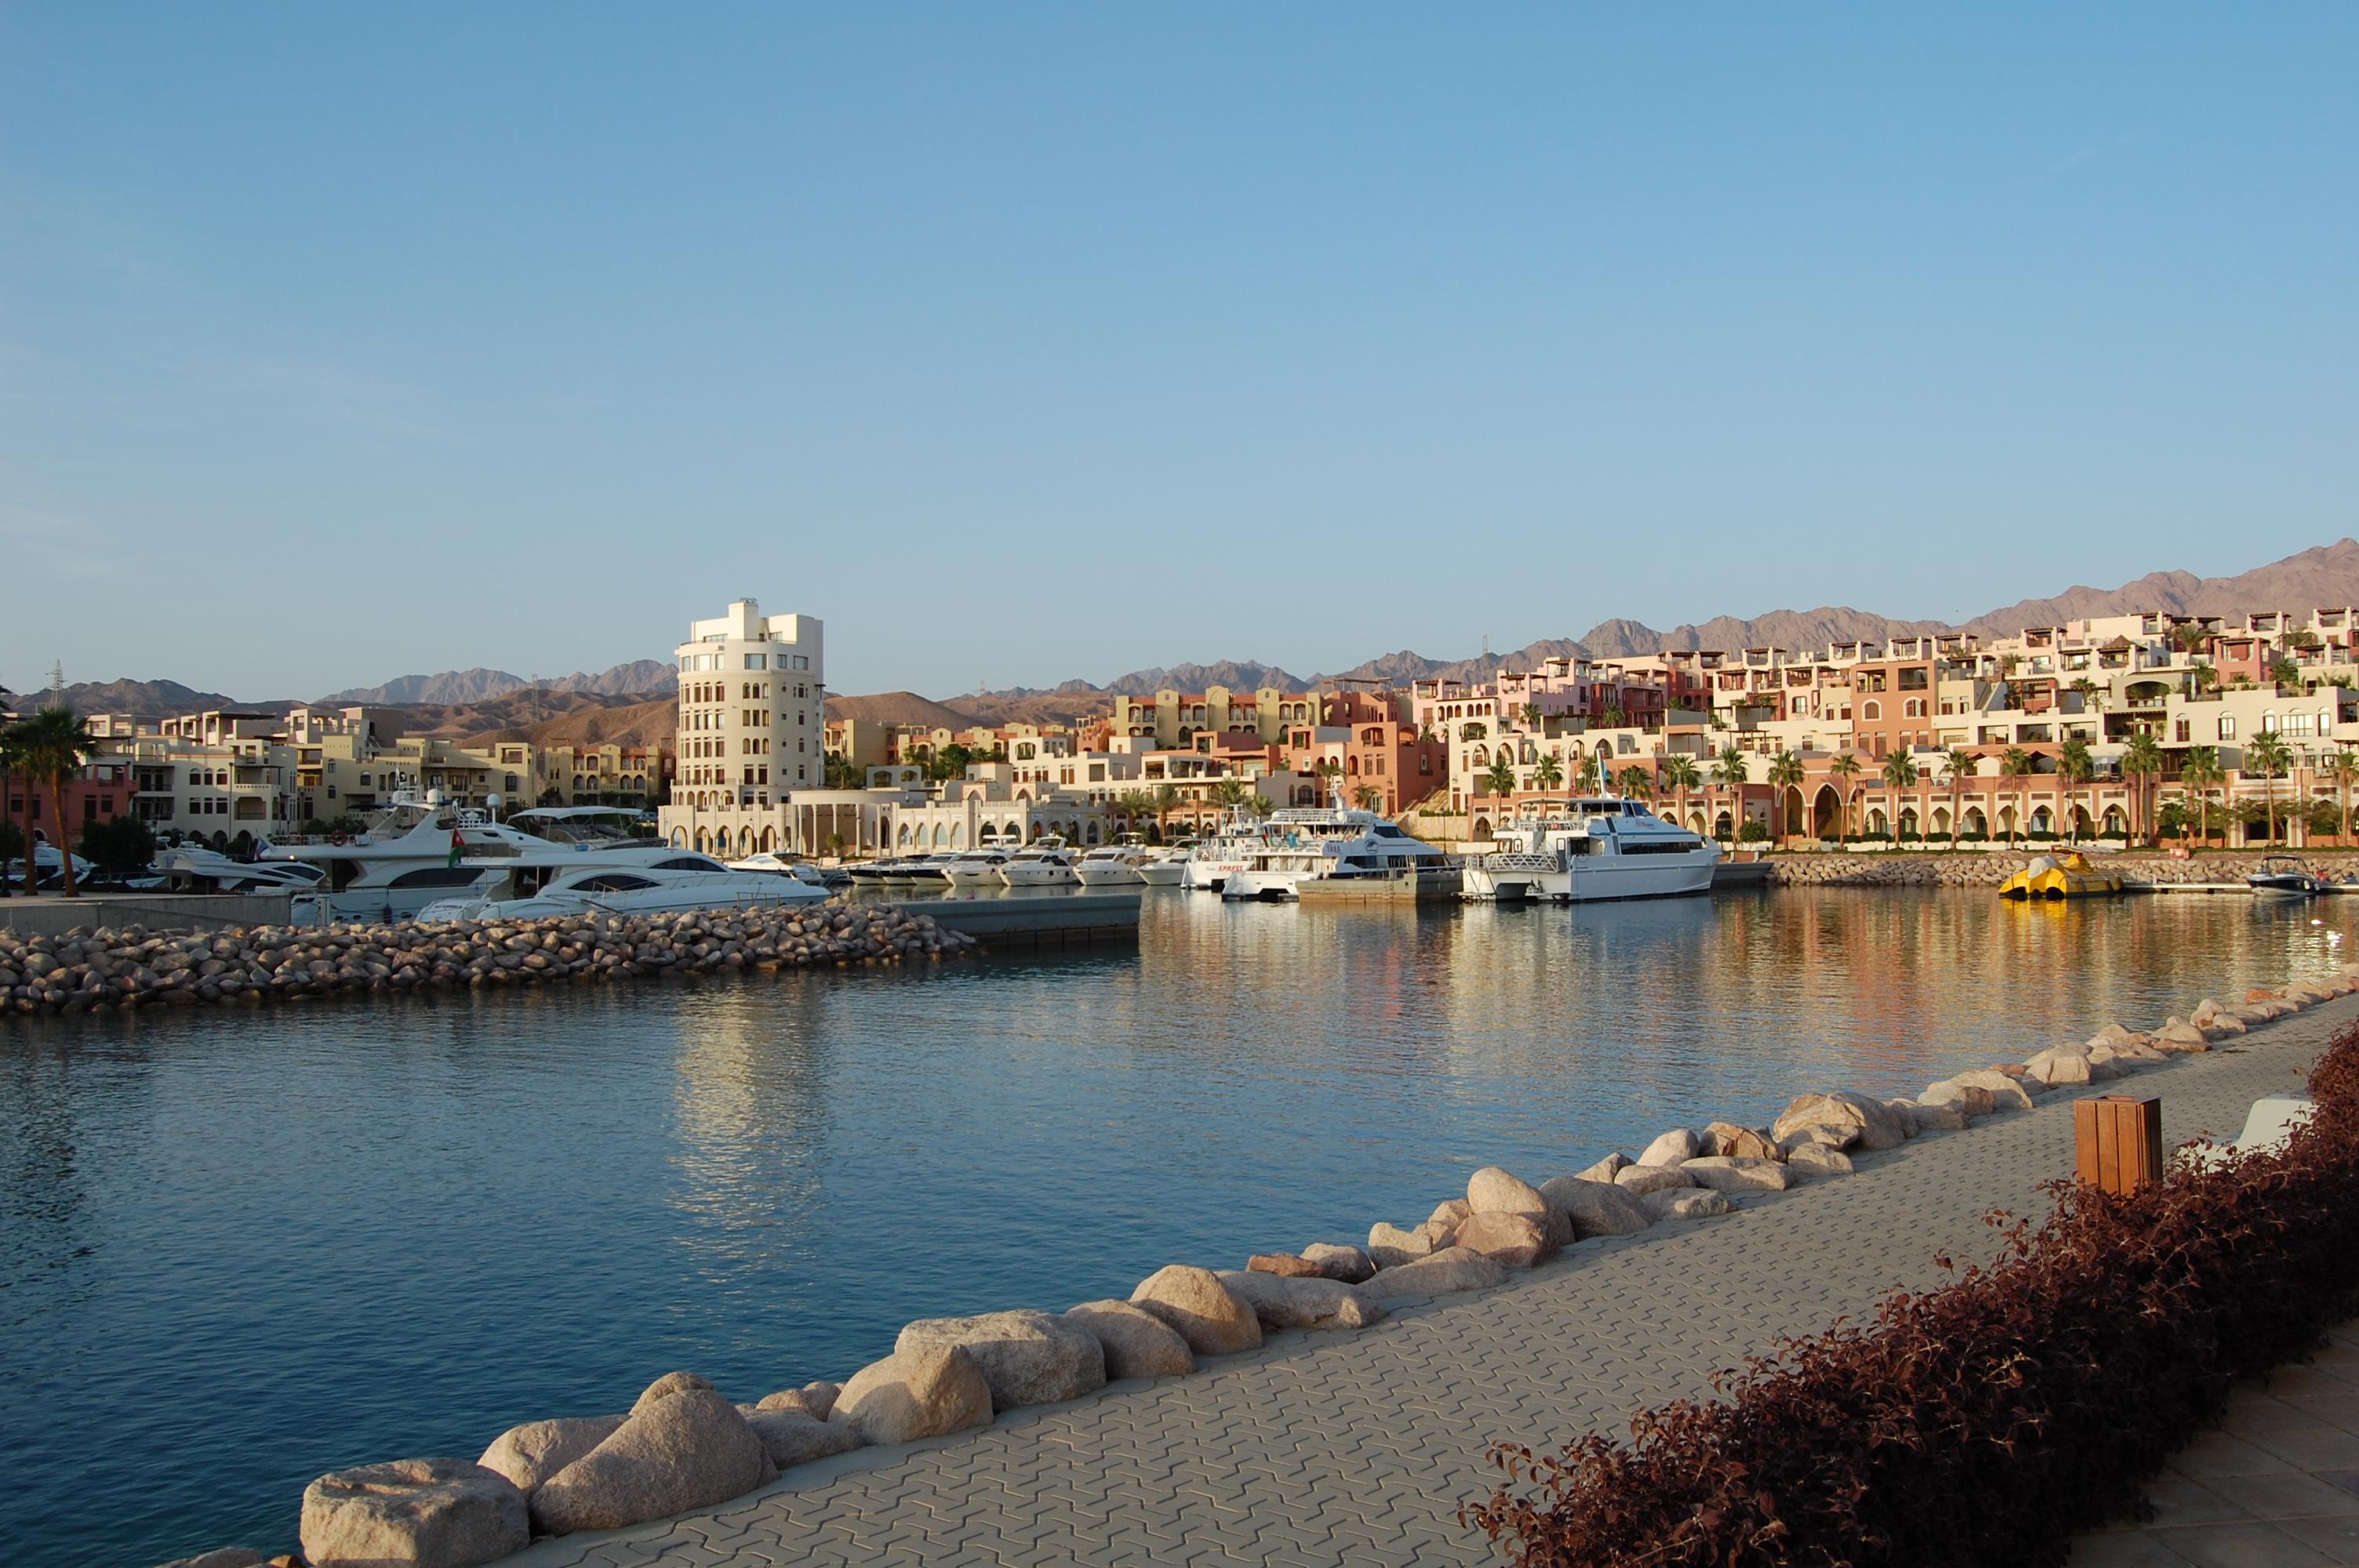 Aqaba Jordan  city pictures gallery : Return to Photos of Aqaba, Jordan